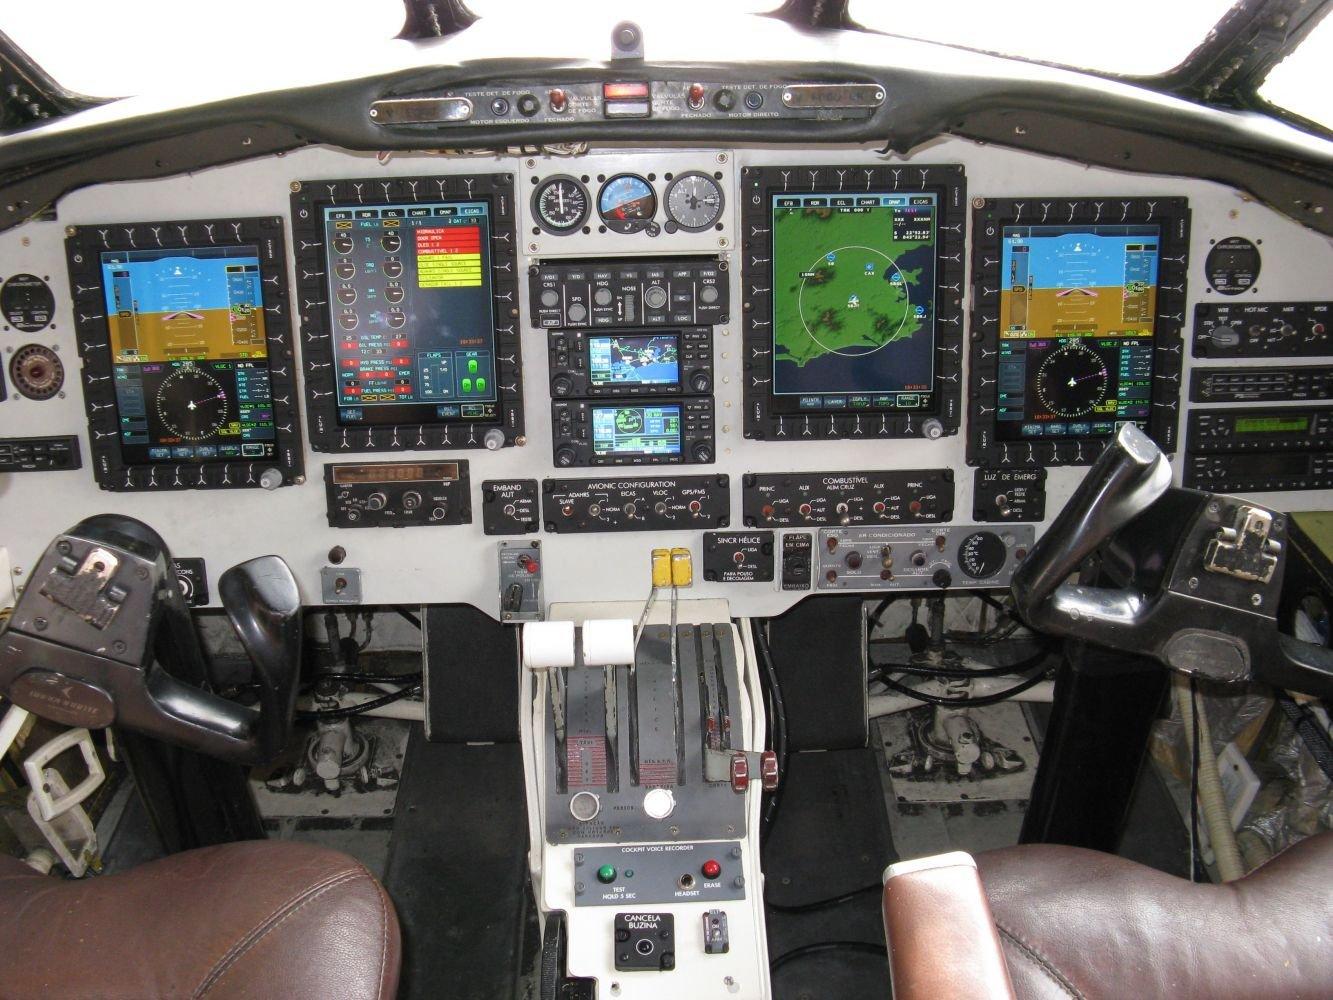 Brazilian Air Force Receives Modernized Maritime Patrol Aircraft